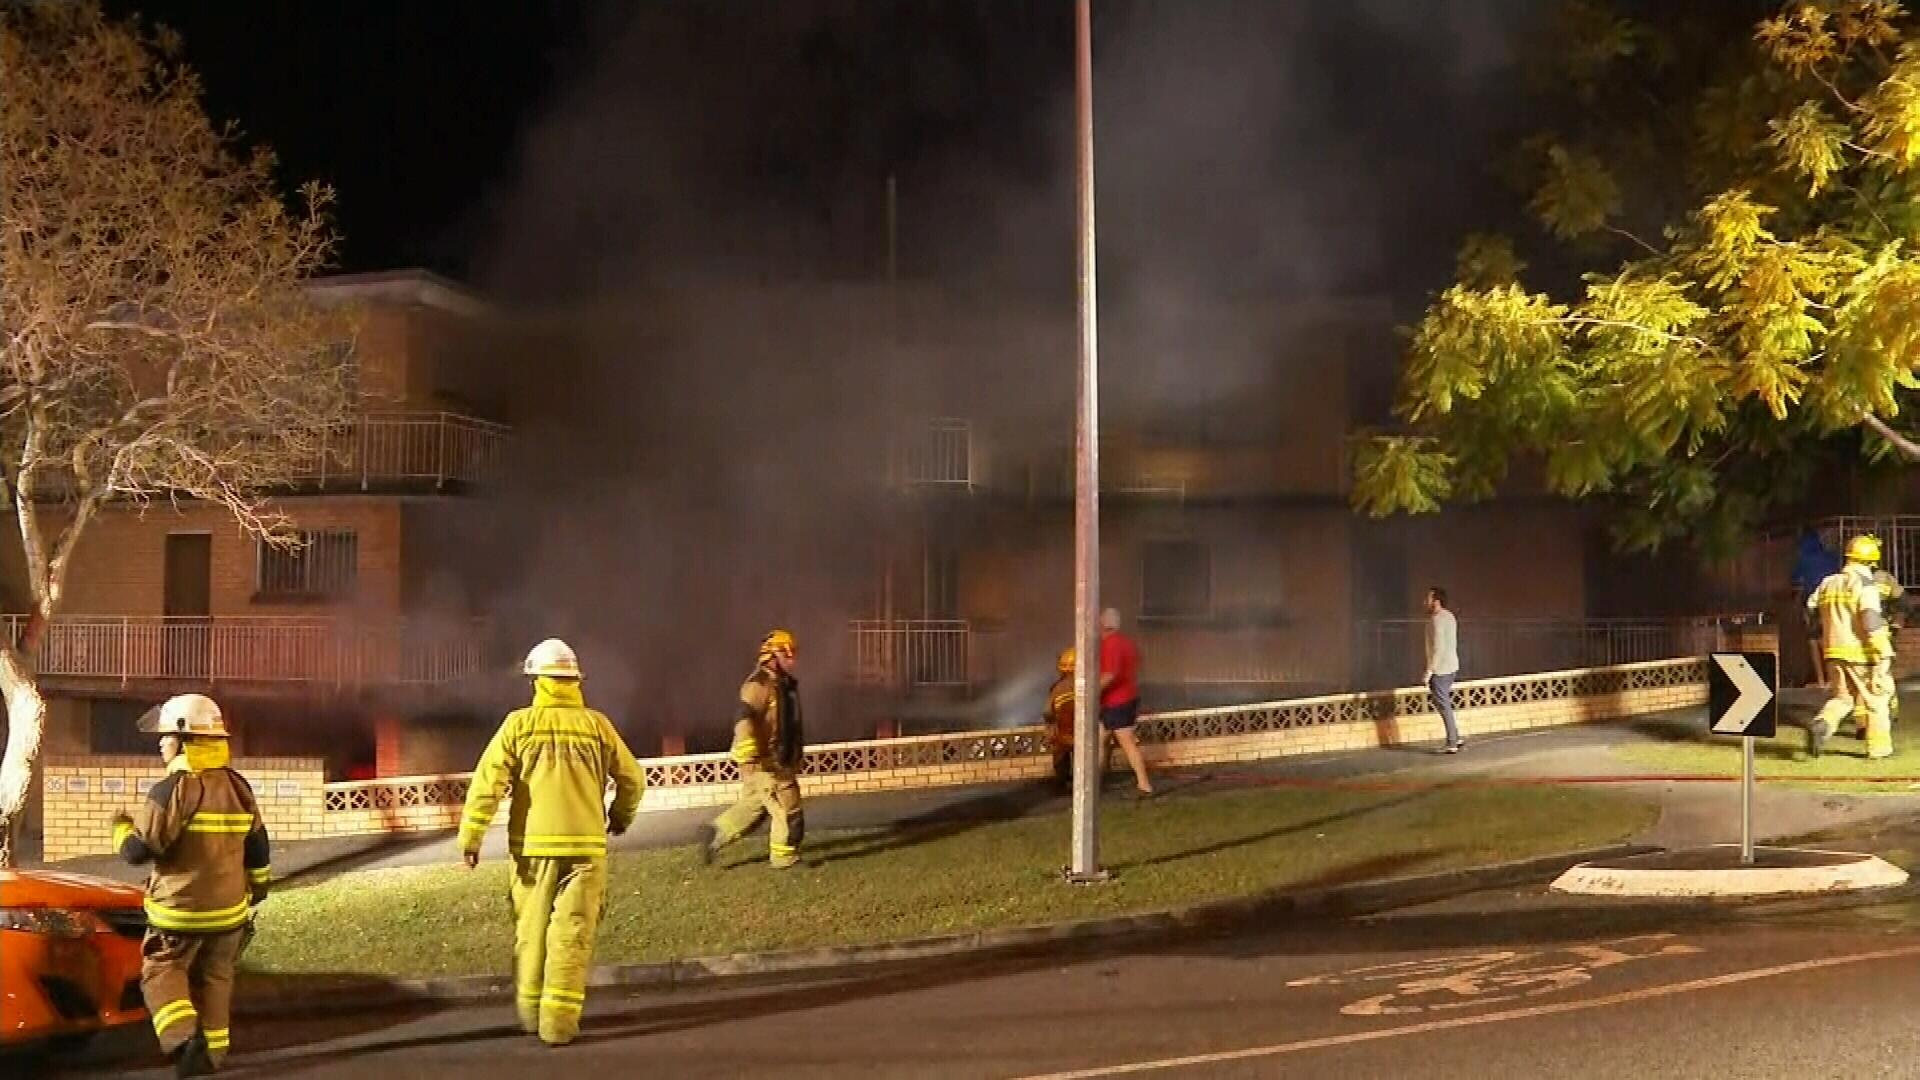 Three suspicious fires in one night rattle neighbourhood